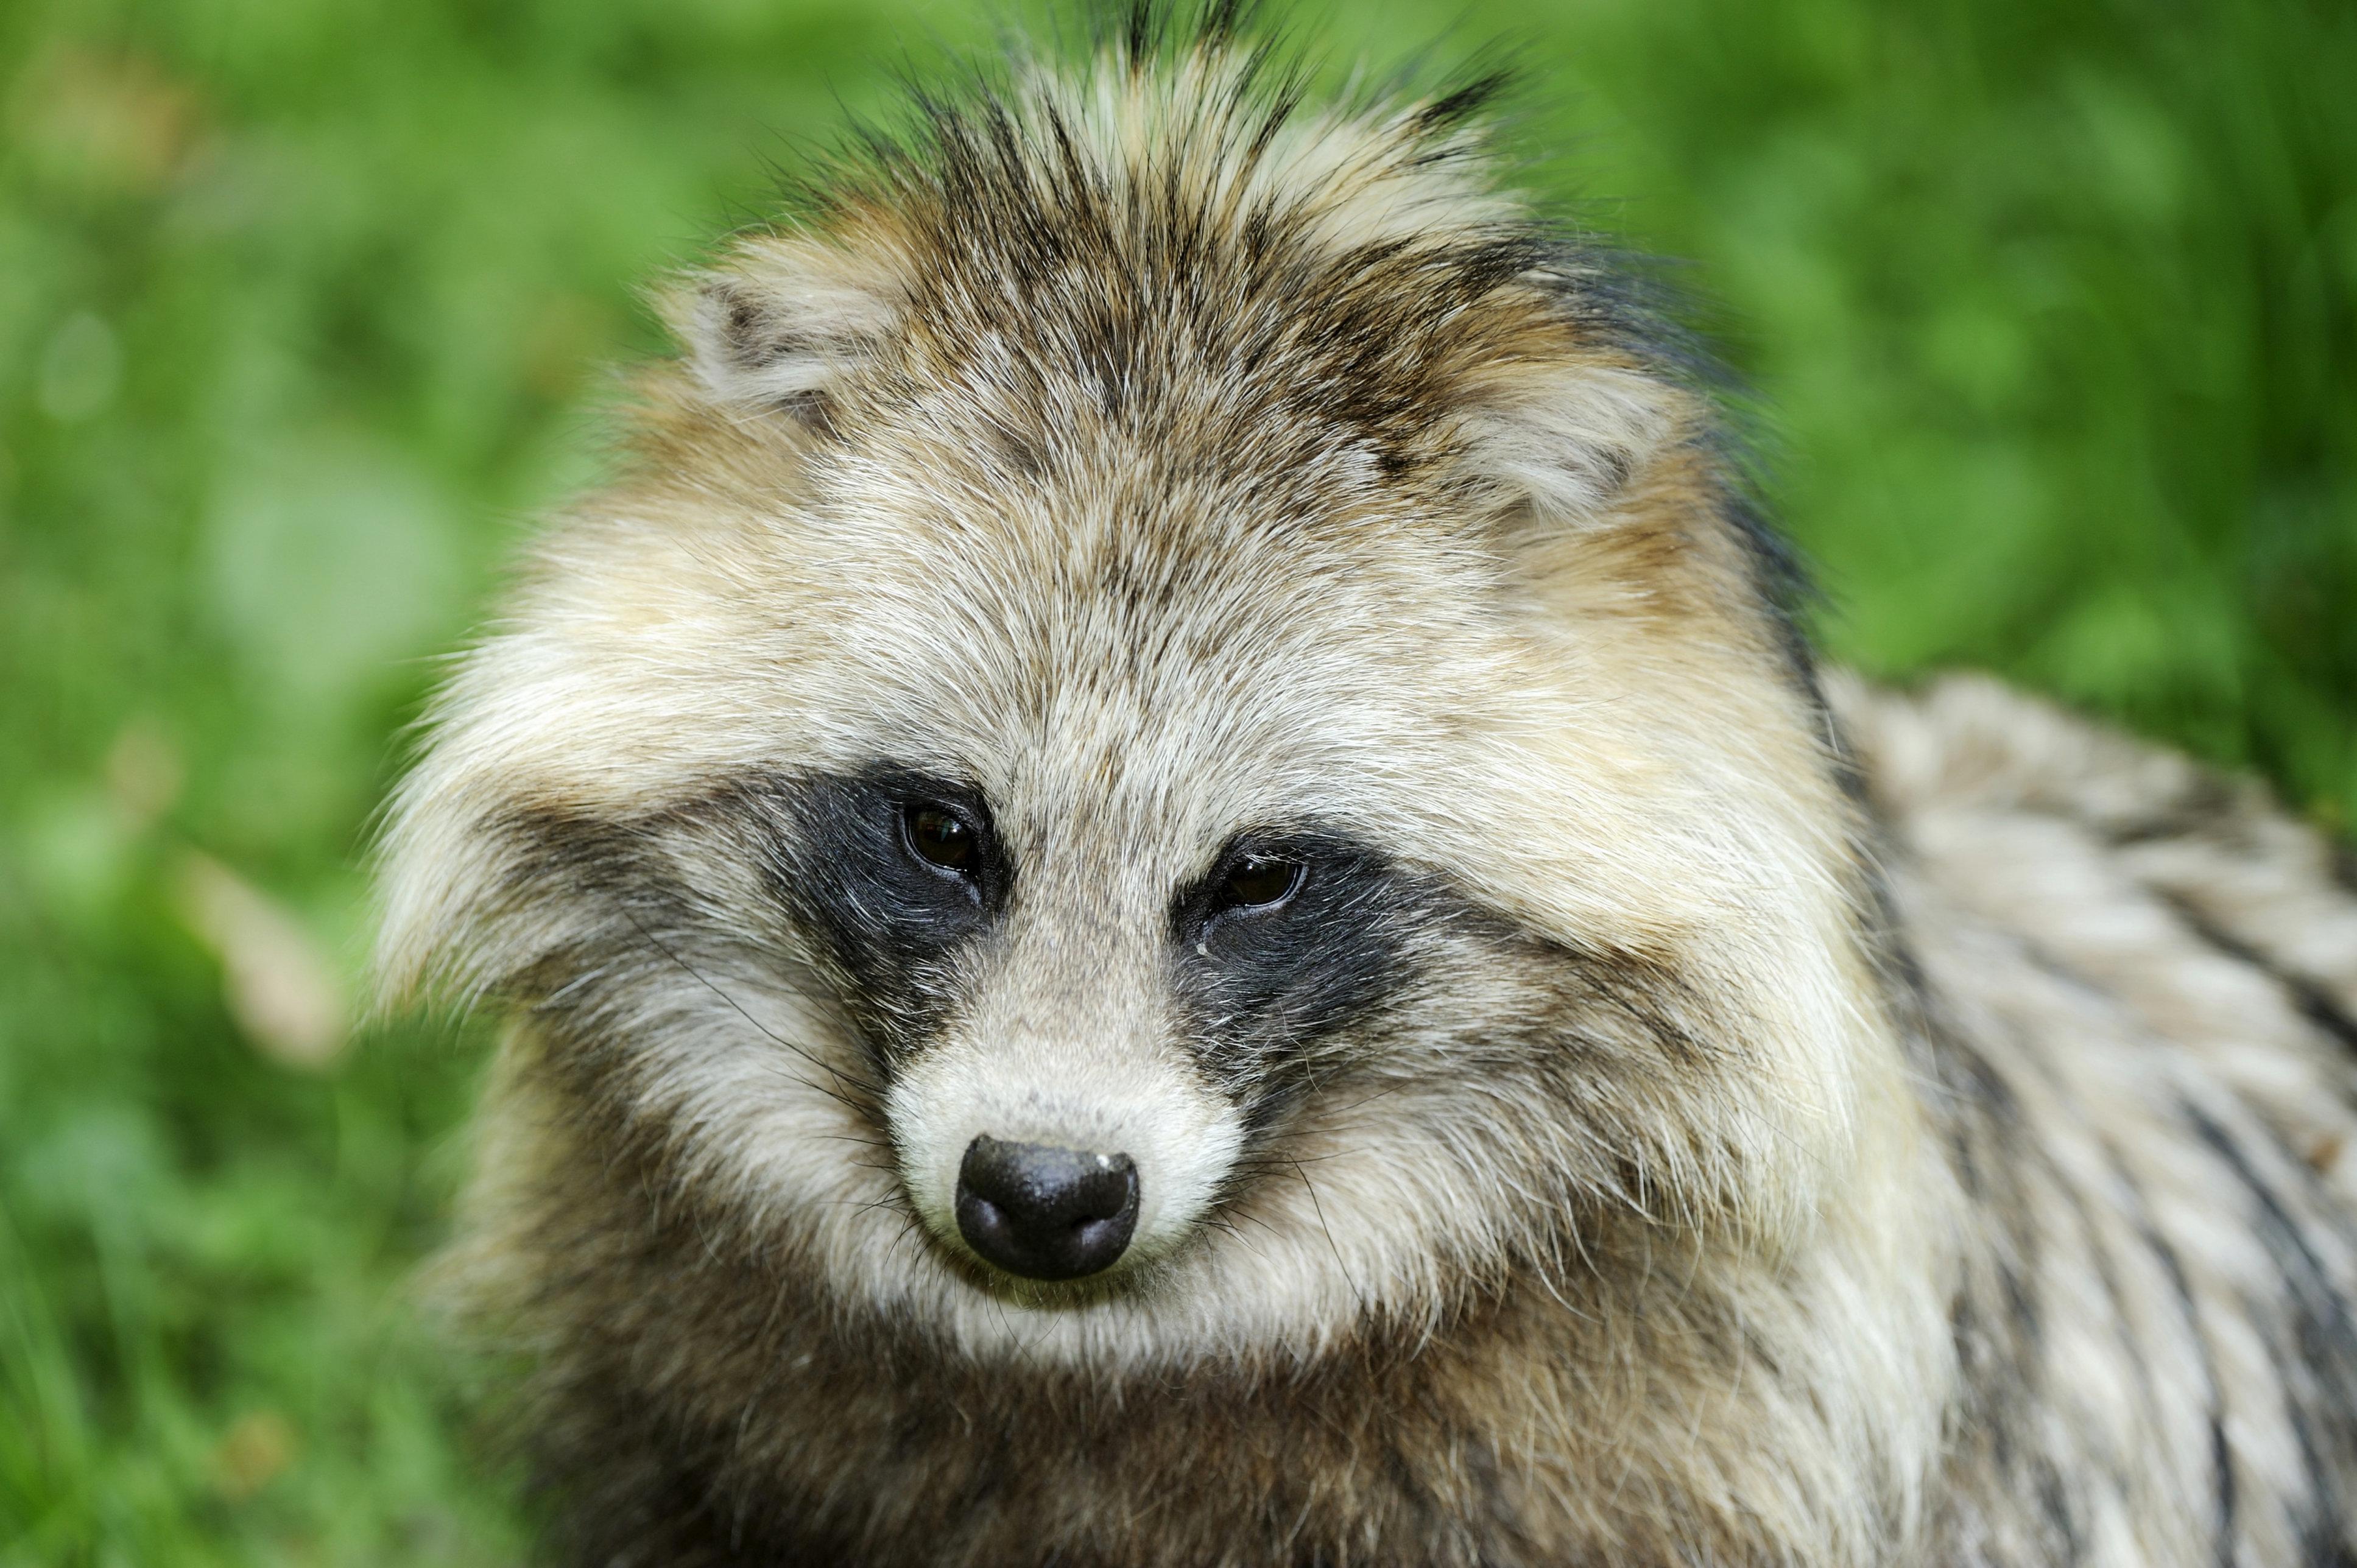 Raccoon dog, Tanuki or Magnut -Nyctereutes procyonoides-, portrait